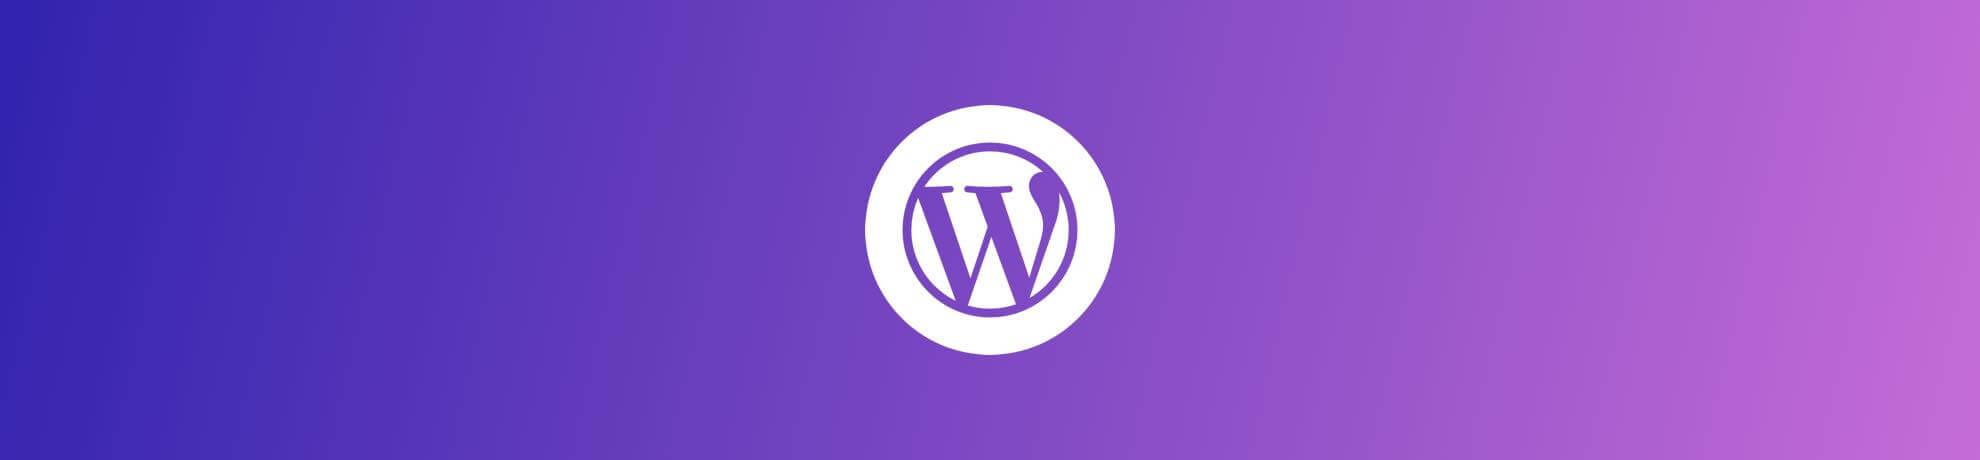 al communication formation wordpress